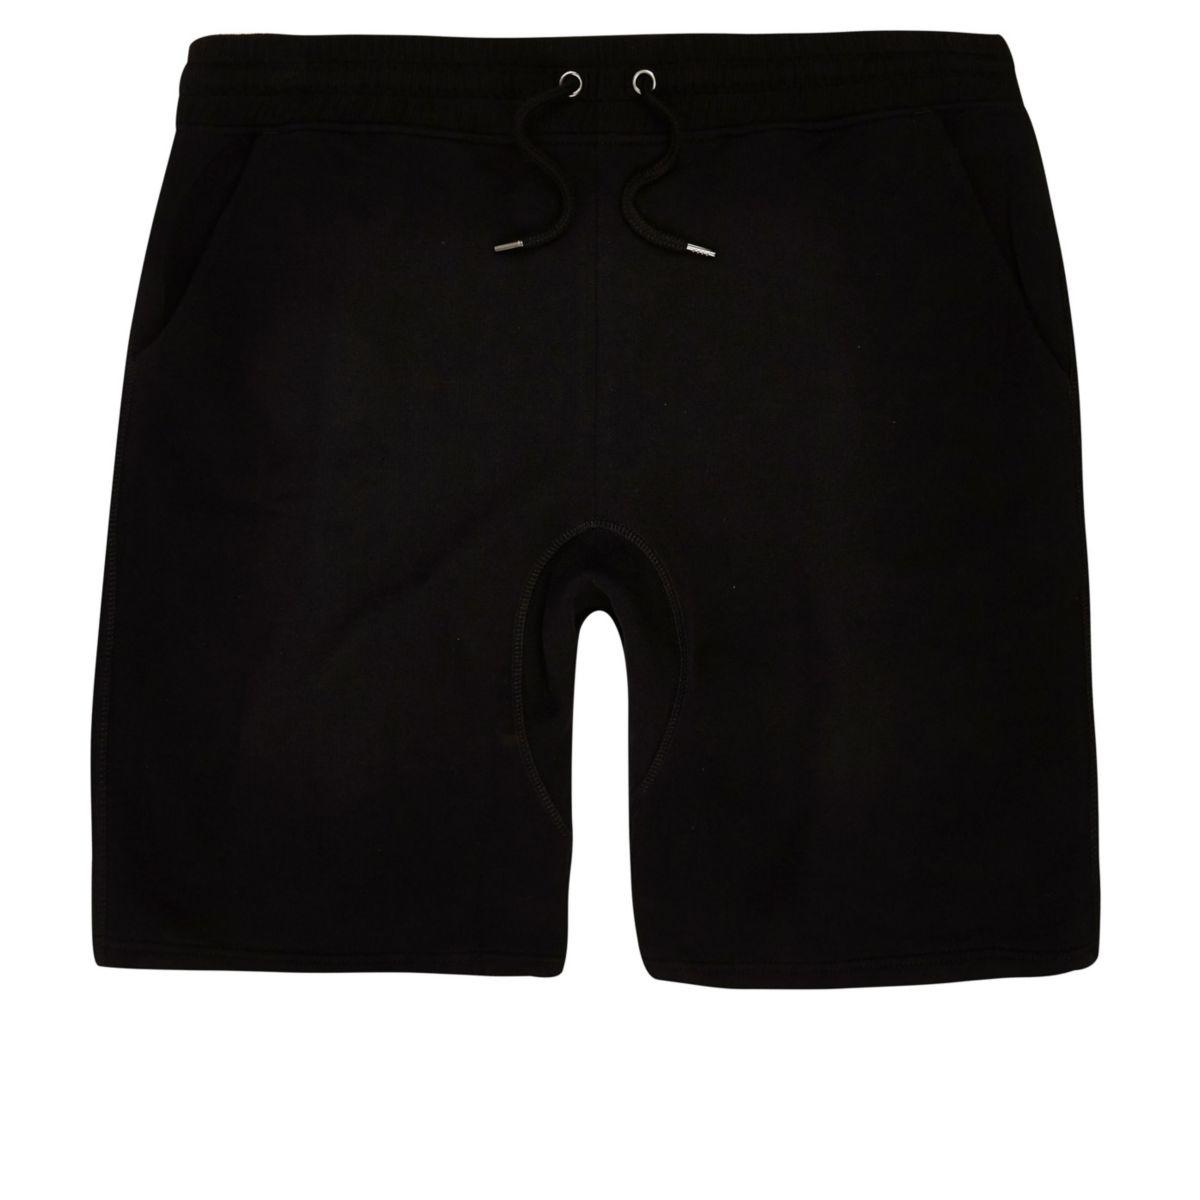 Big and Tall black jersey shorts